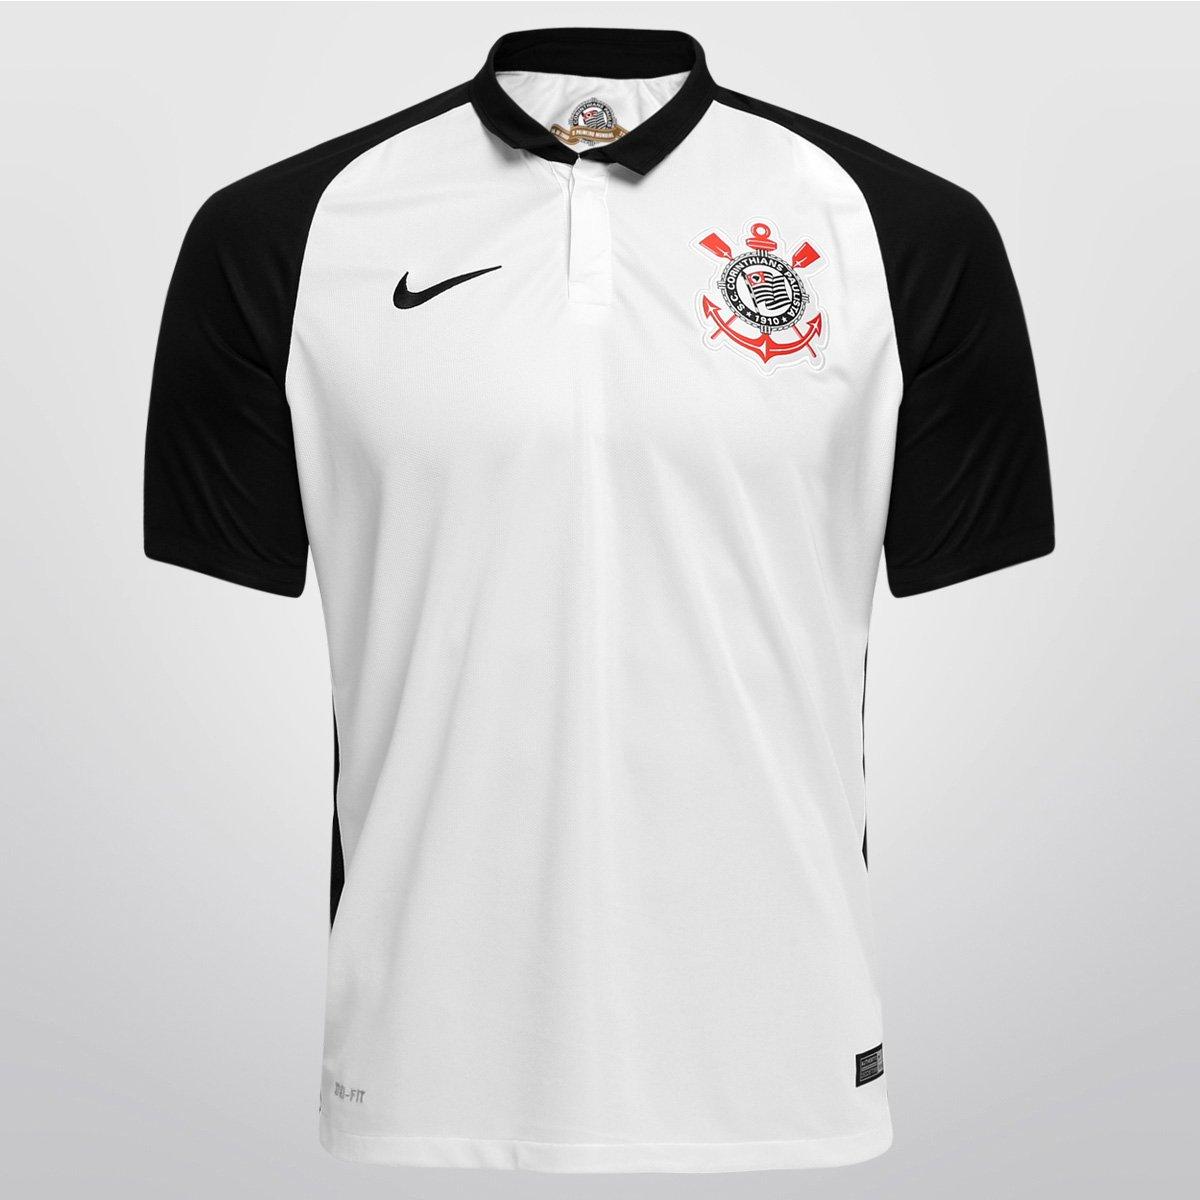 39127eb073cba Camisa Corinthians I 15 16 s nº - Torcedor Nike Masculina - Compre Agora